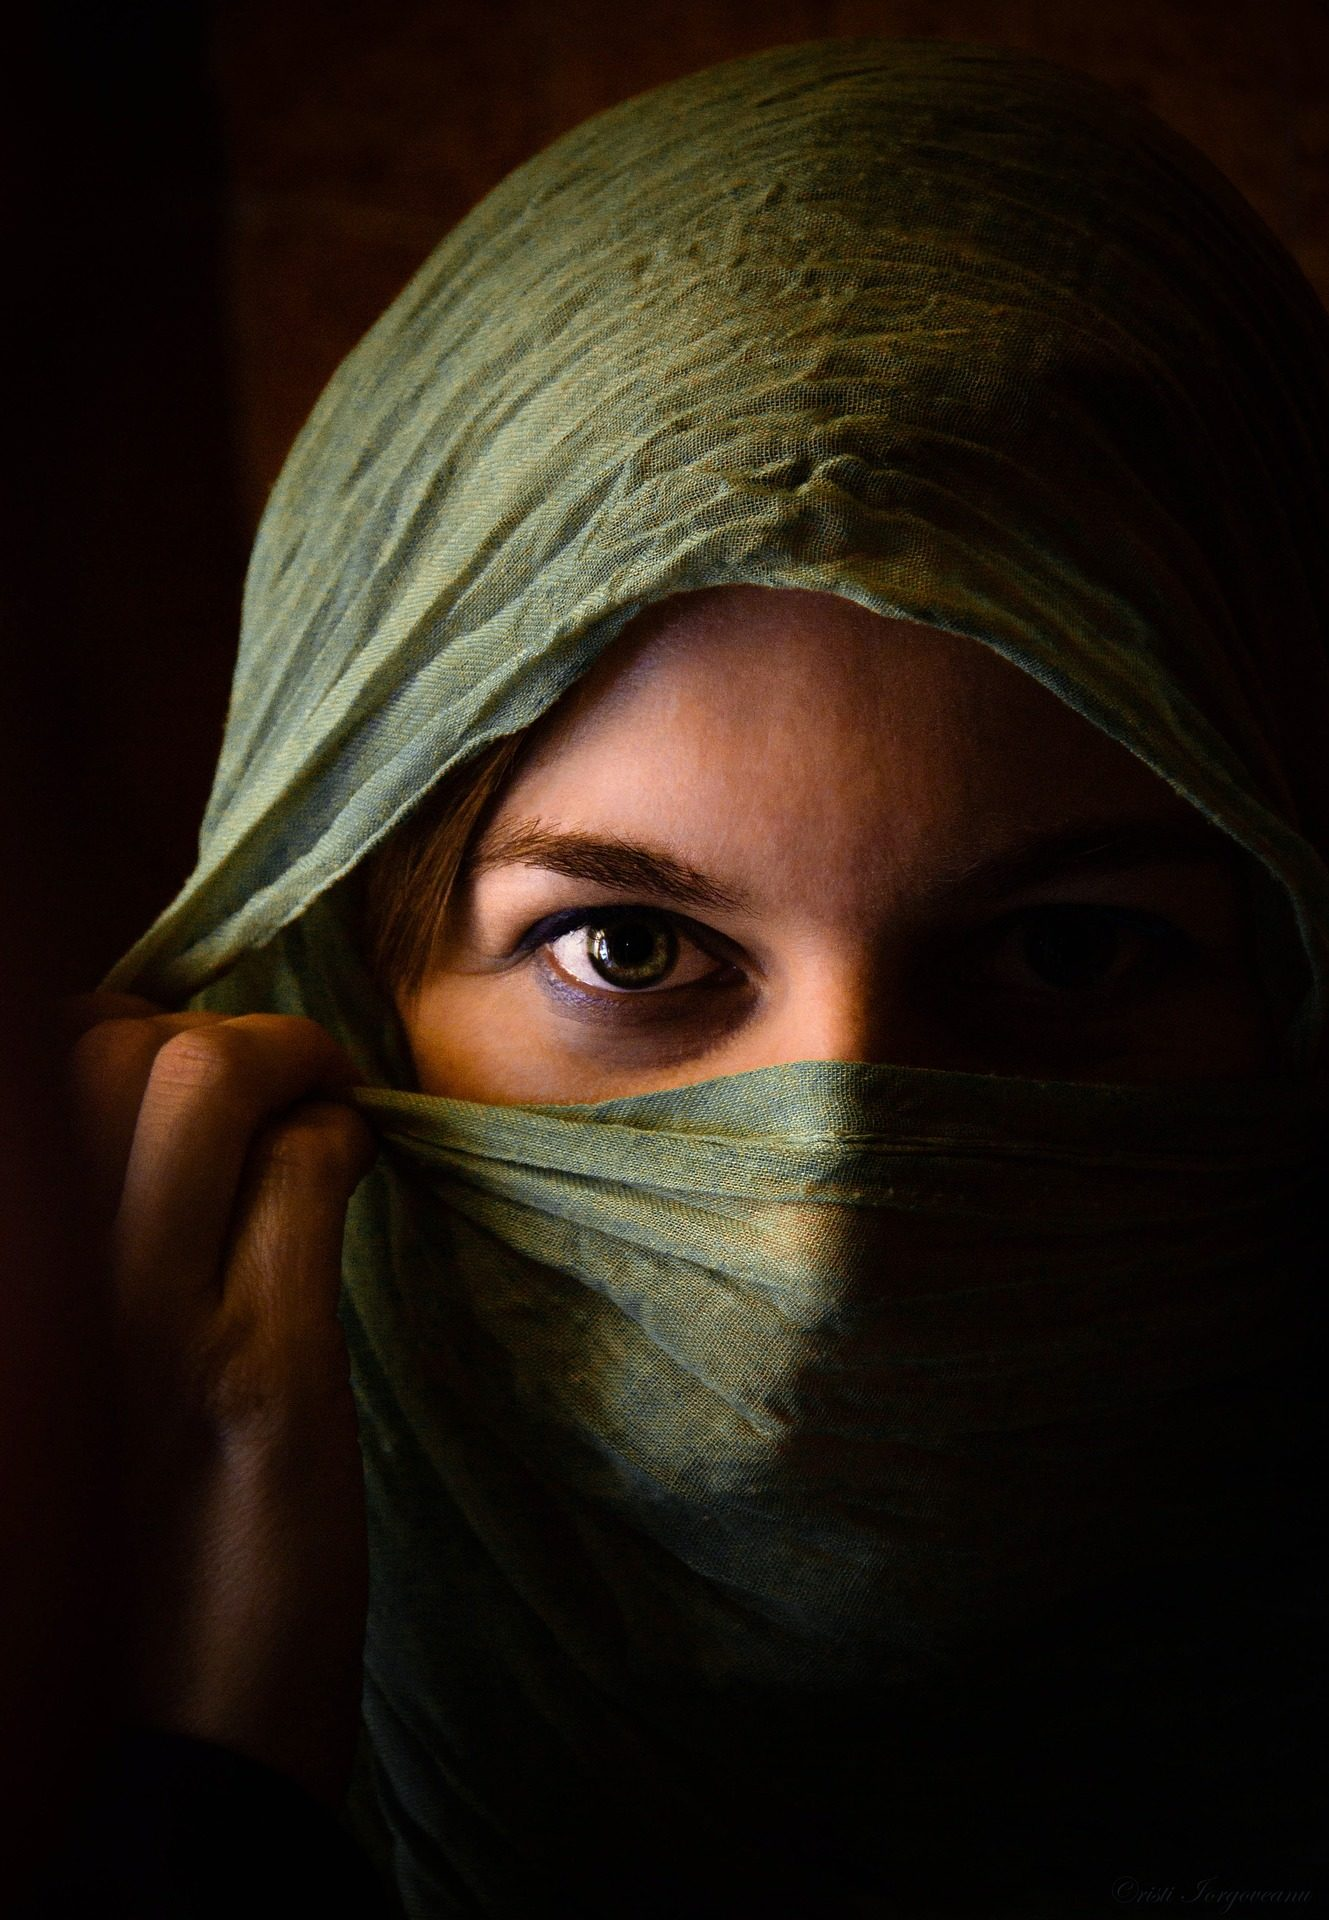 महिला, आँखें, घूंघट, fular, देखो - HD वॉलपेपर - प्रोफेसर-falken.com